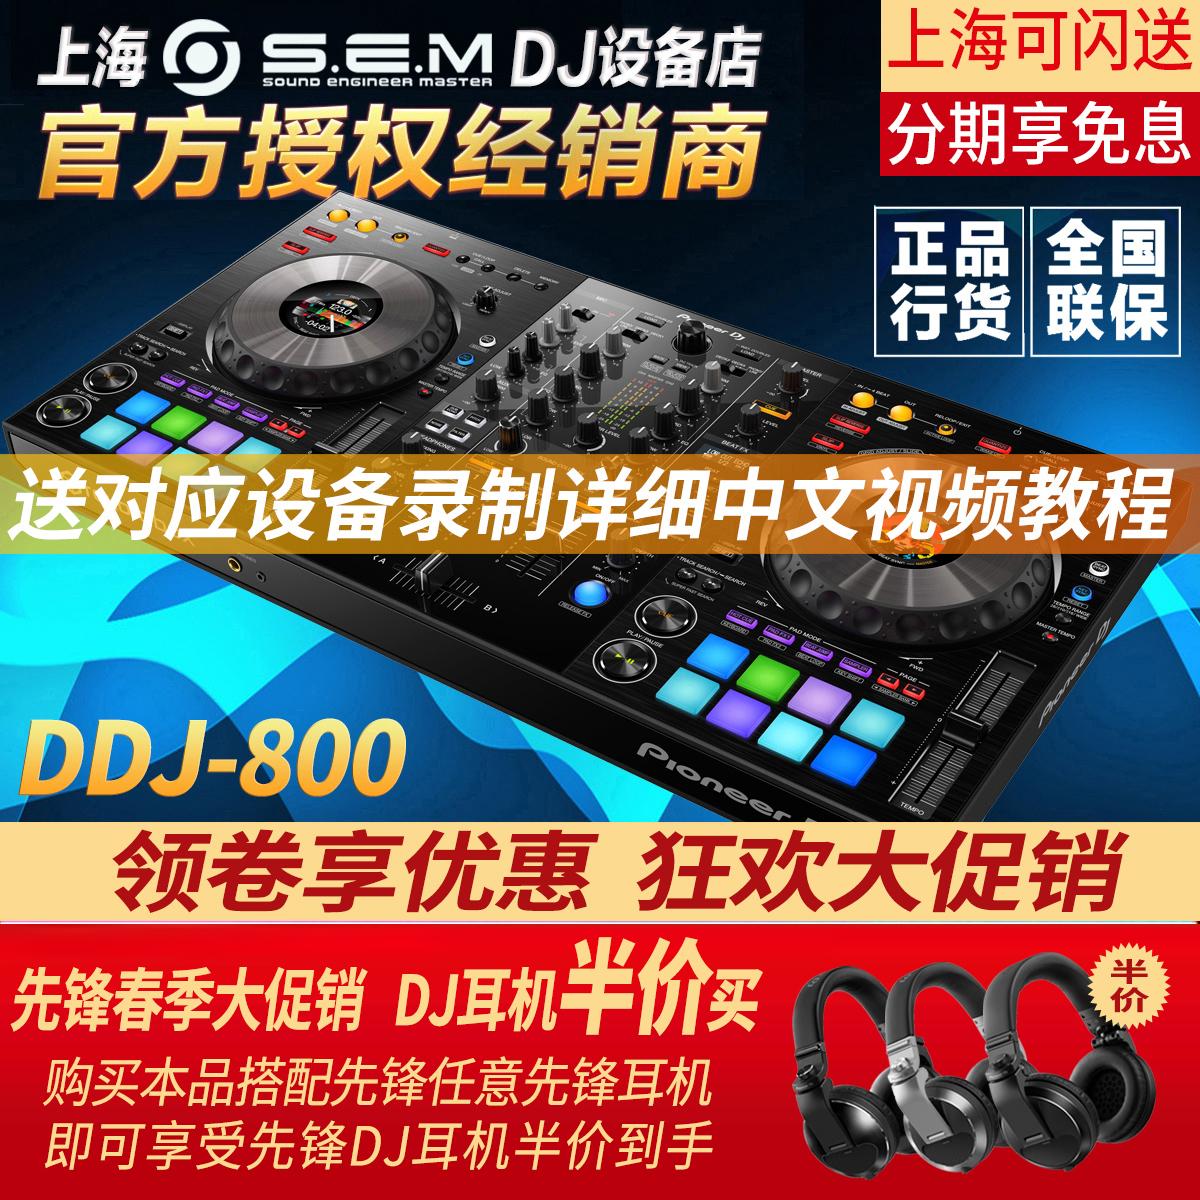 DJ установки / микшеры Артикул 592352332675